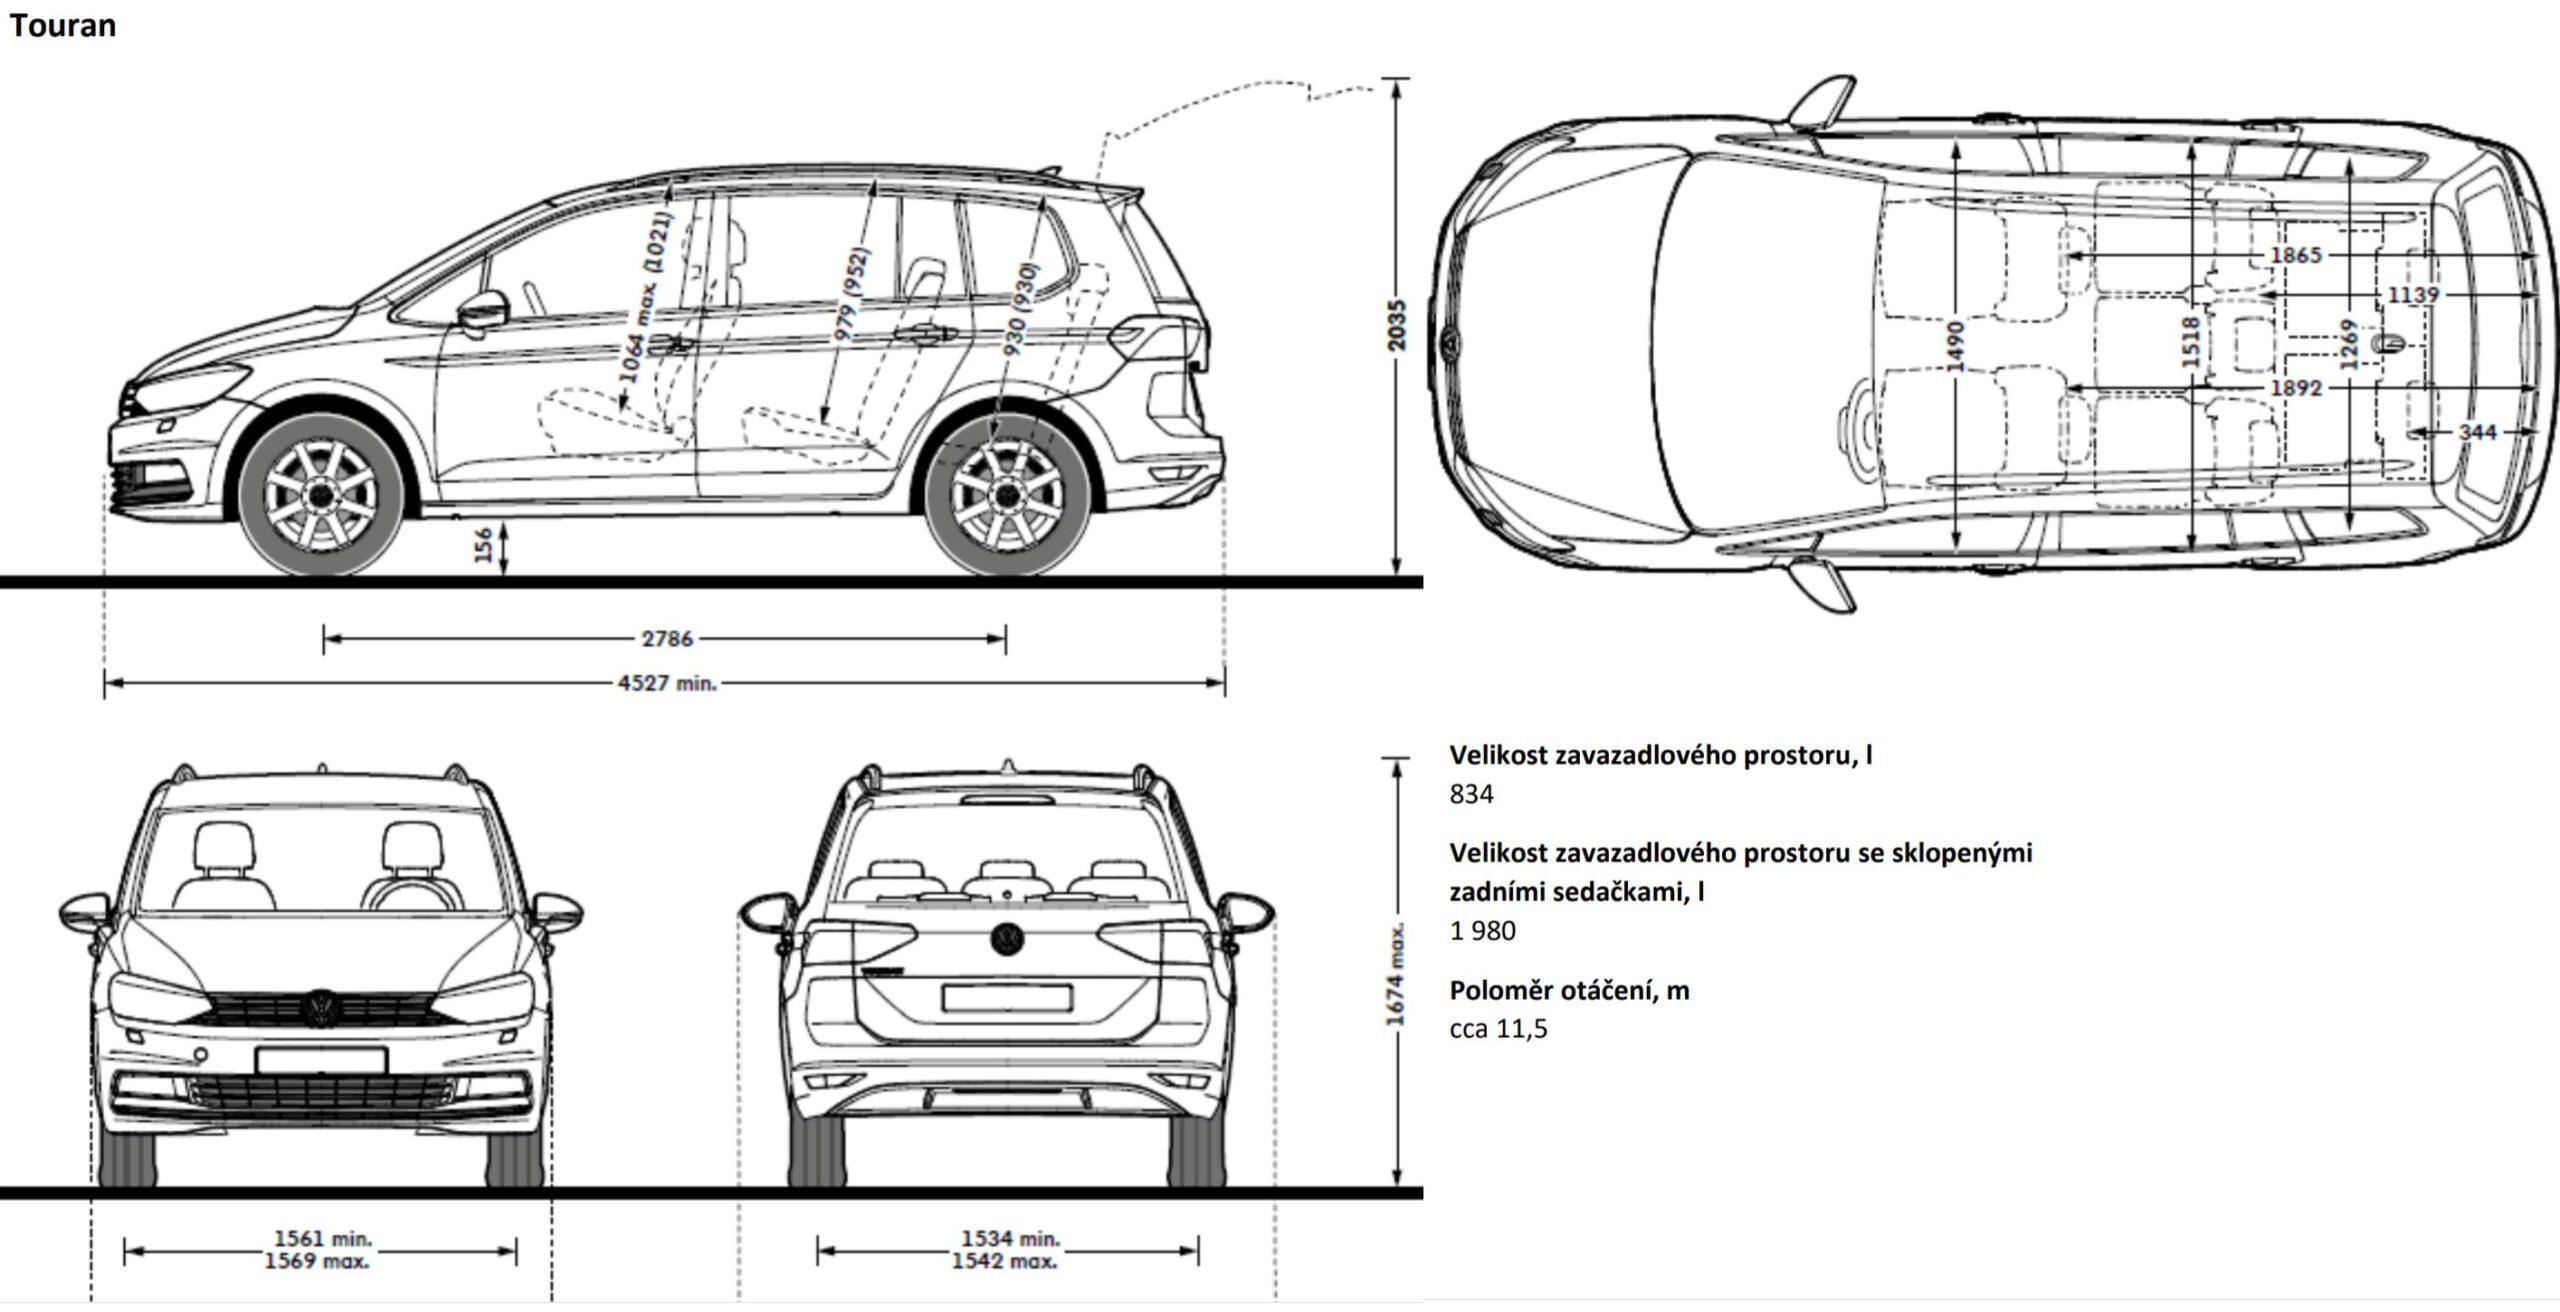 Volkswagen Touran VW rozměry rozvor výška délka šířka kufr